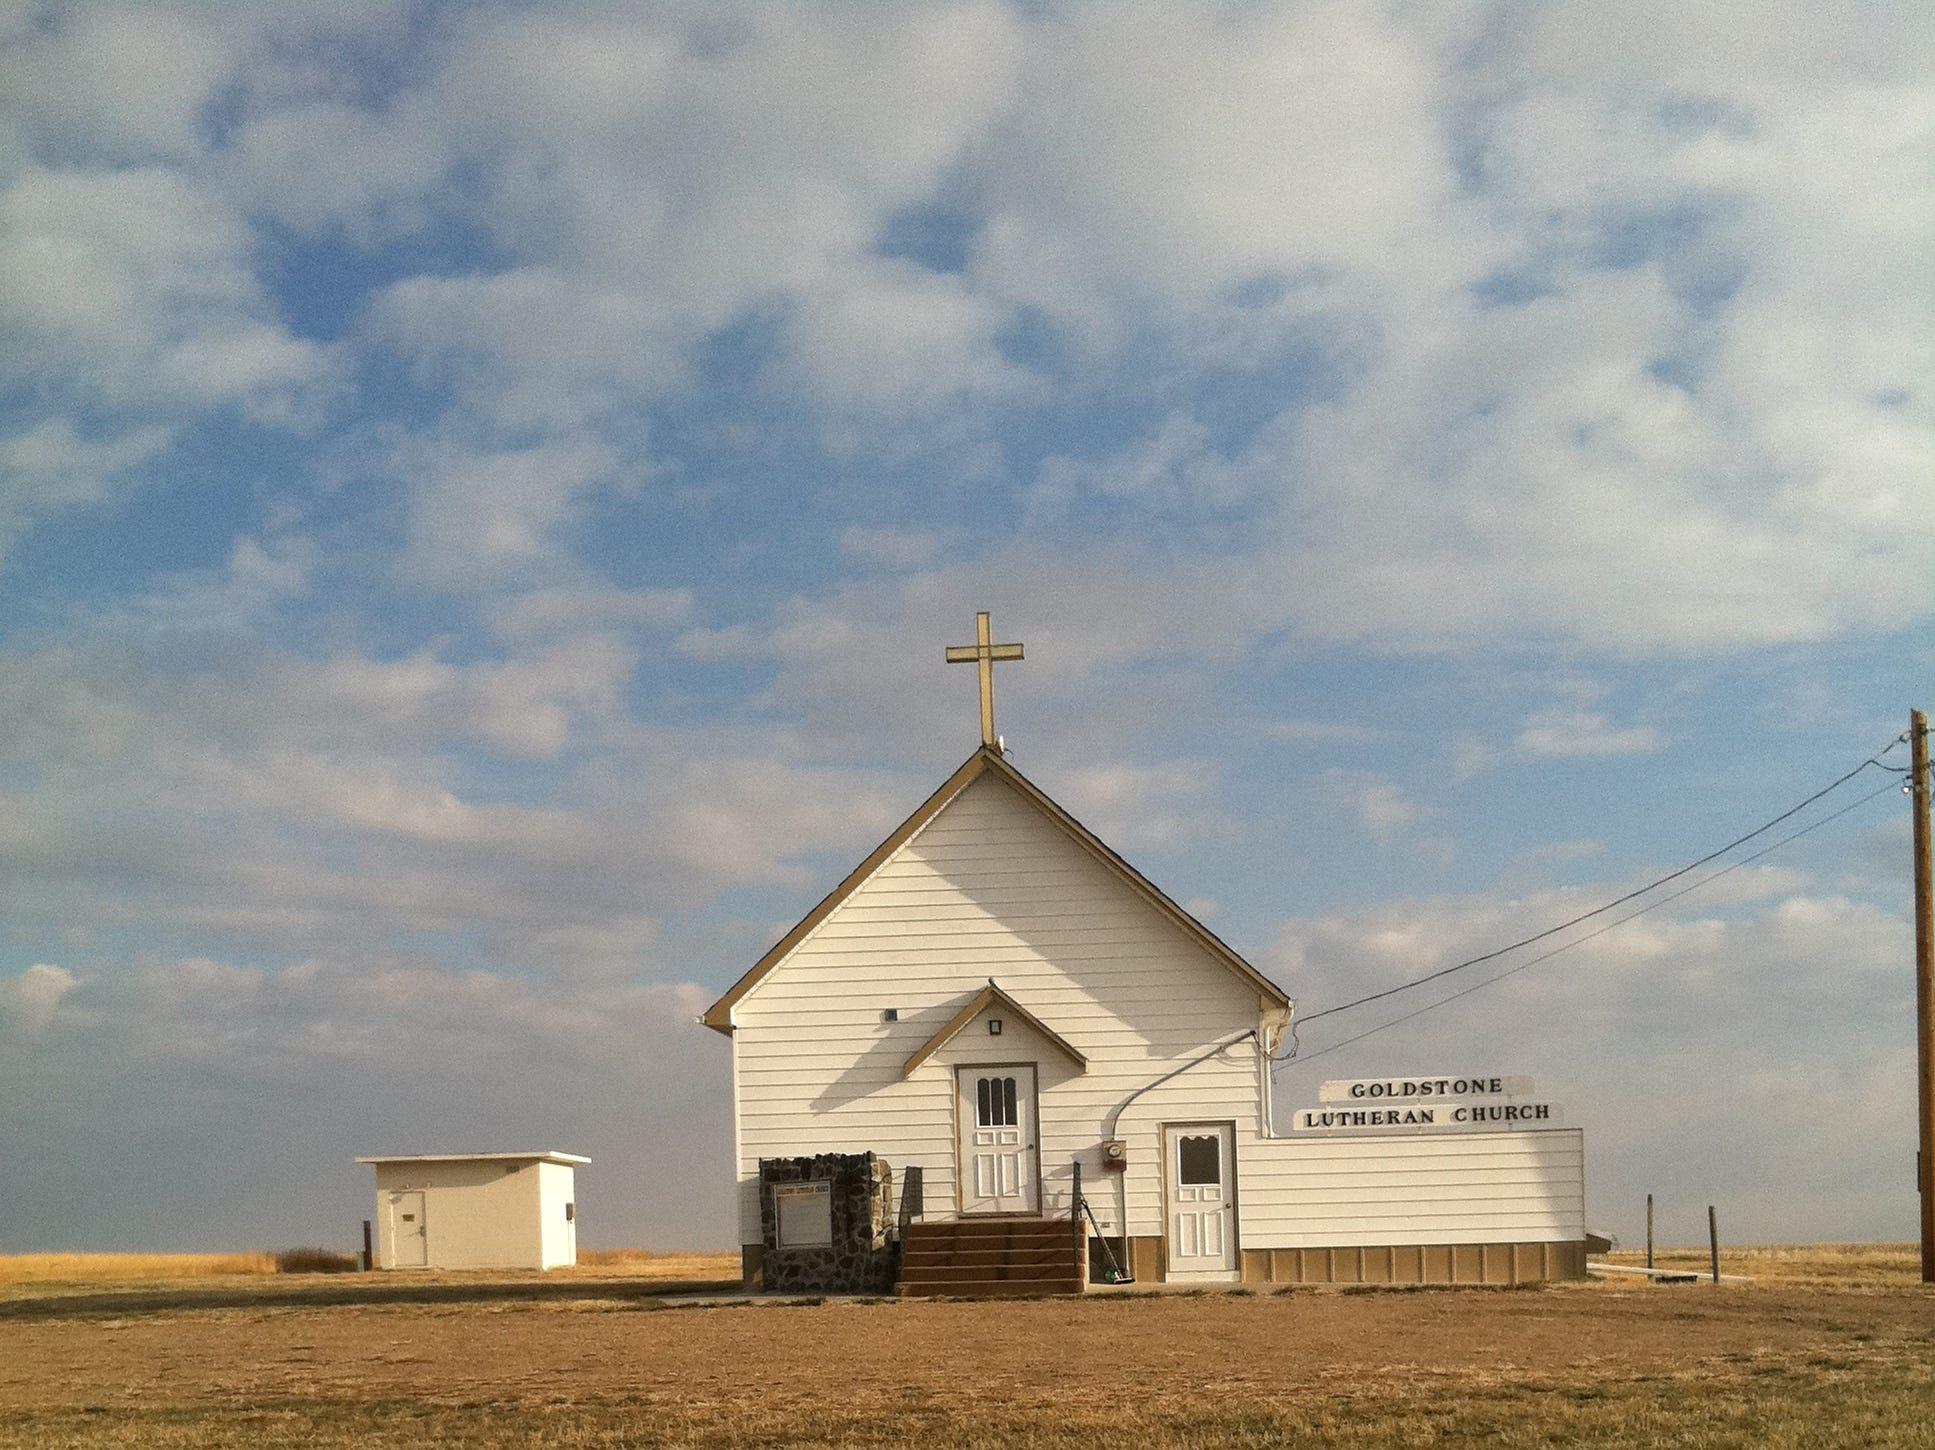 Goldstone Lutheran Church